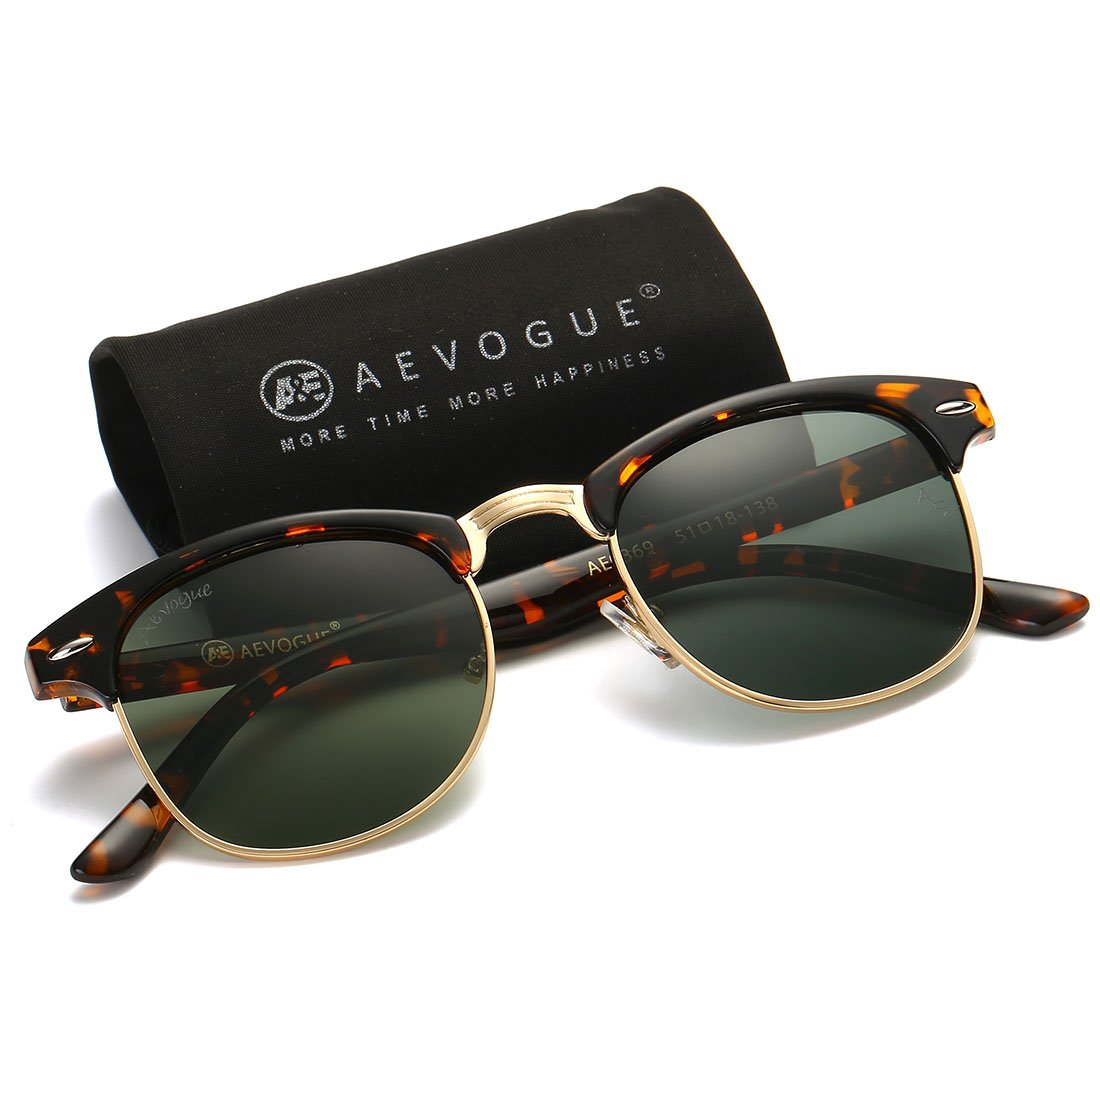 AEVOGUE Polarized Sunglasses Semi-Rimless Frame Brand Designer Classic AE0369 (Tortoise&G15, 48) by AEVOGUE